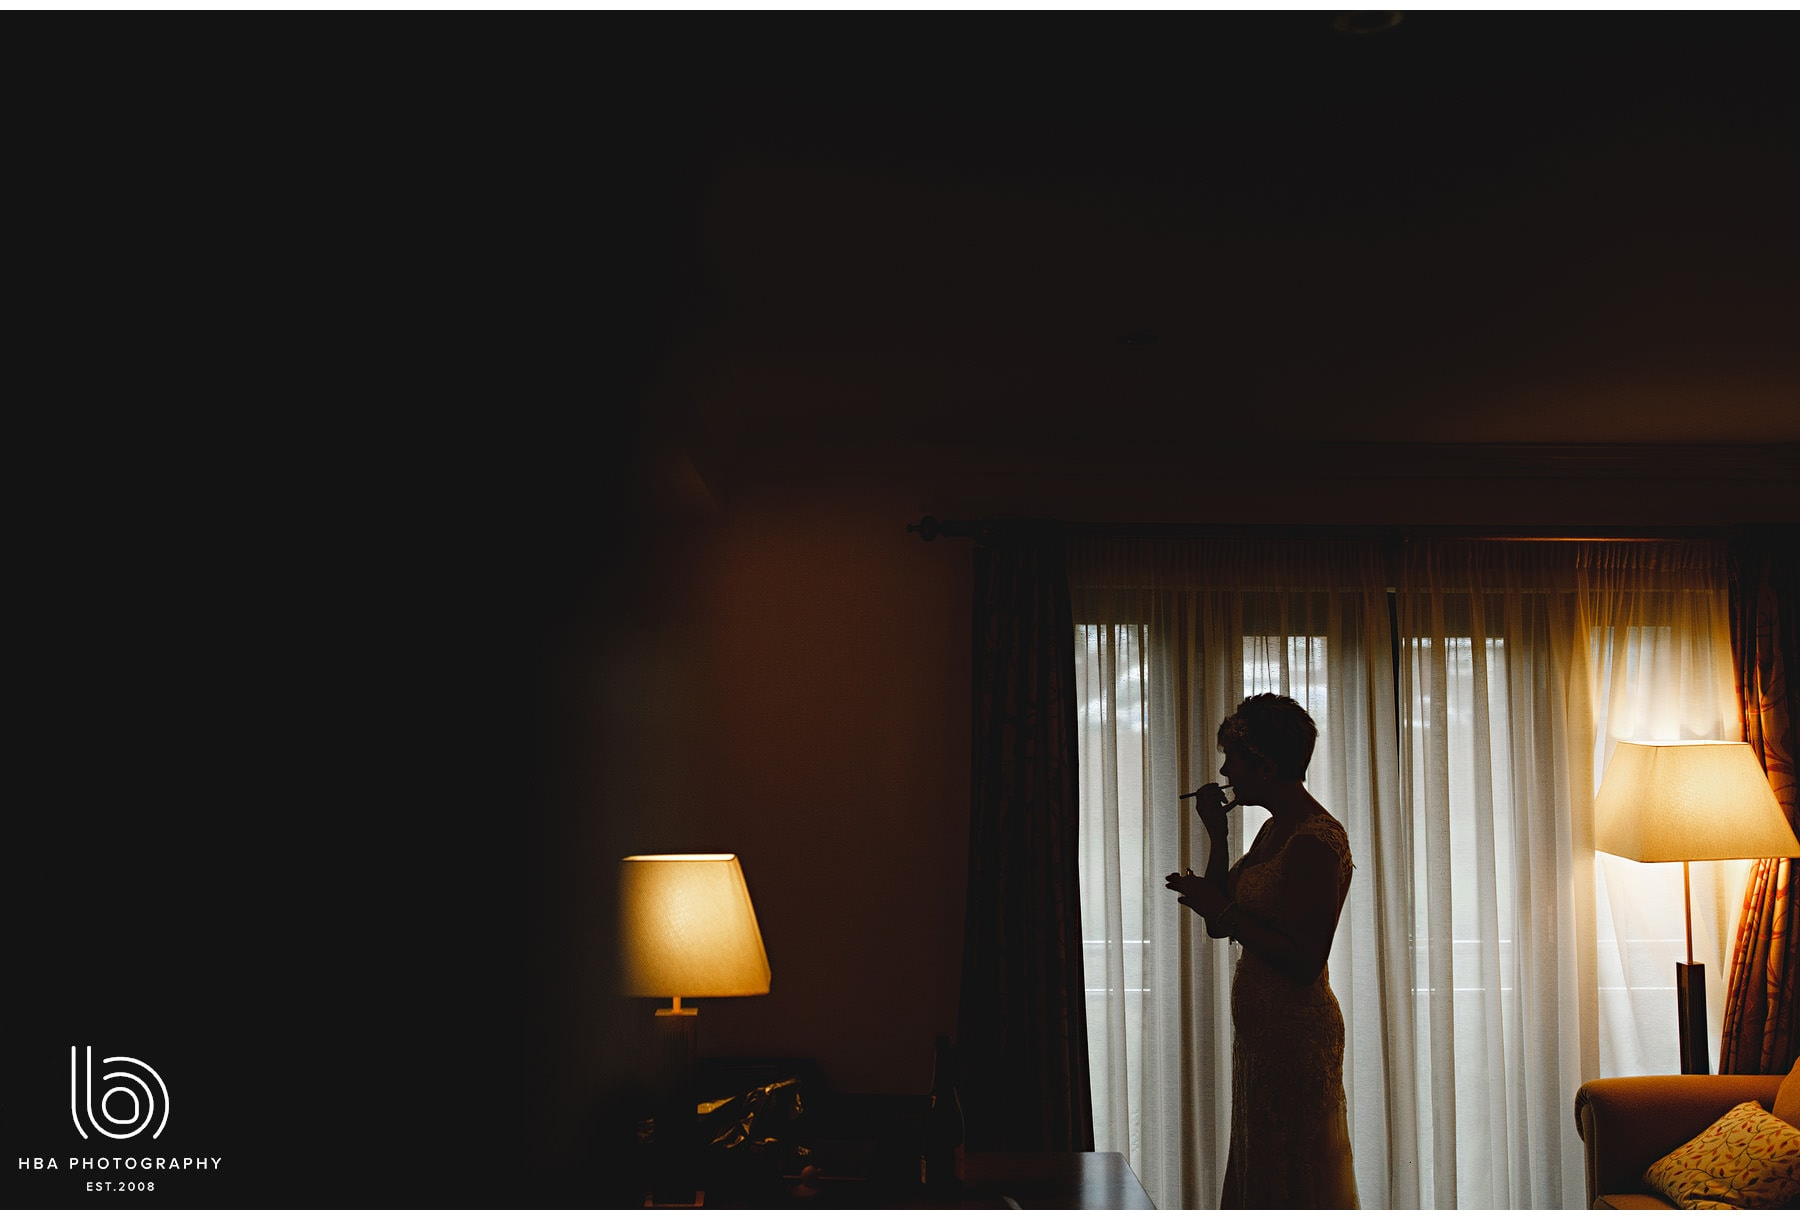 the bride in silhouette doing her lipstick